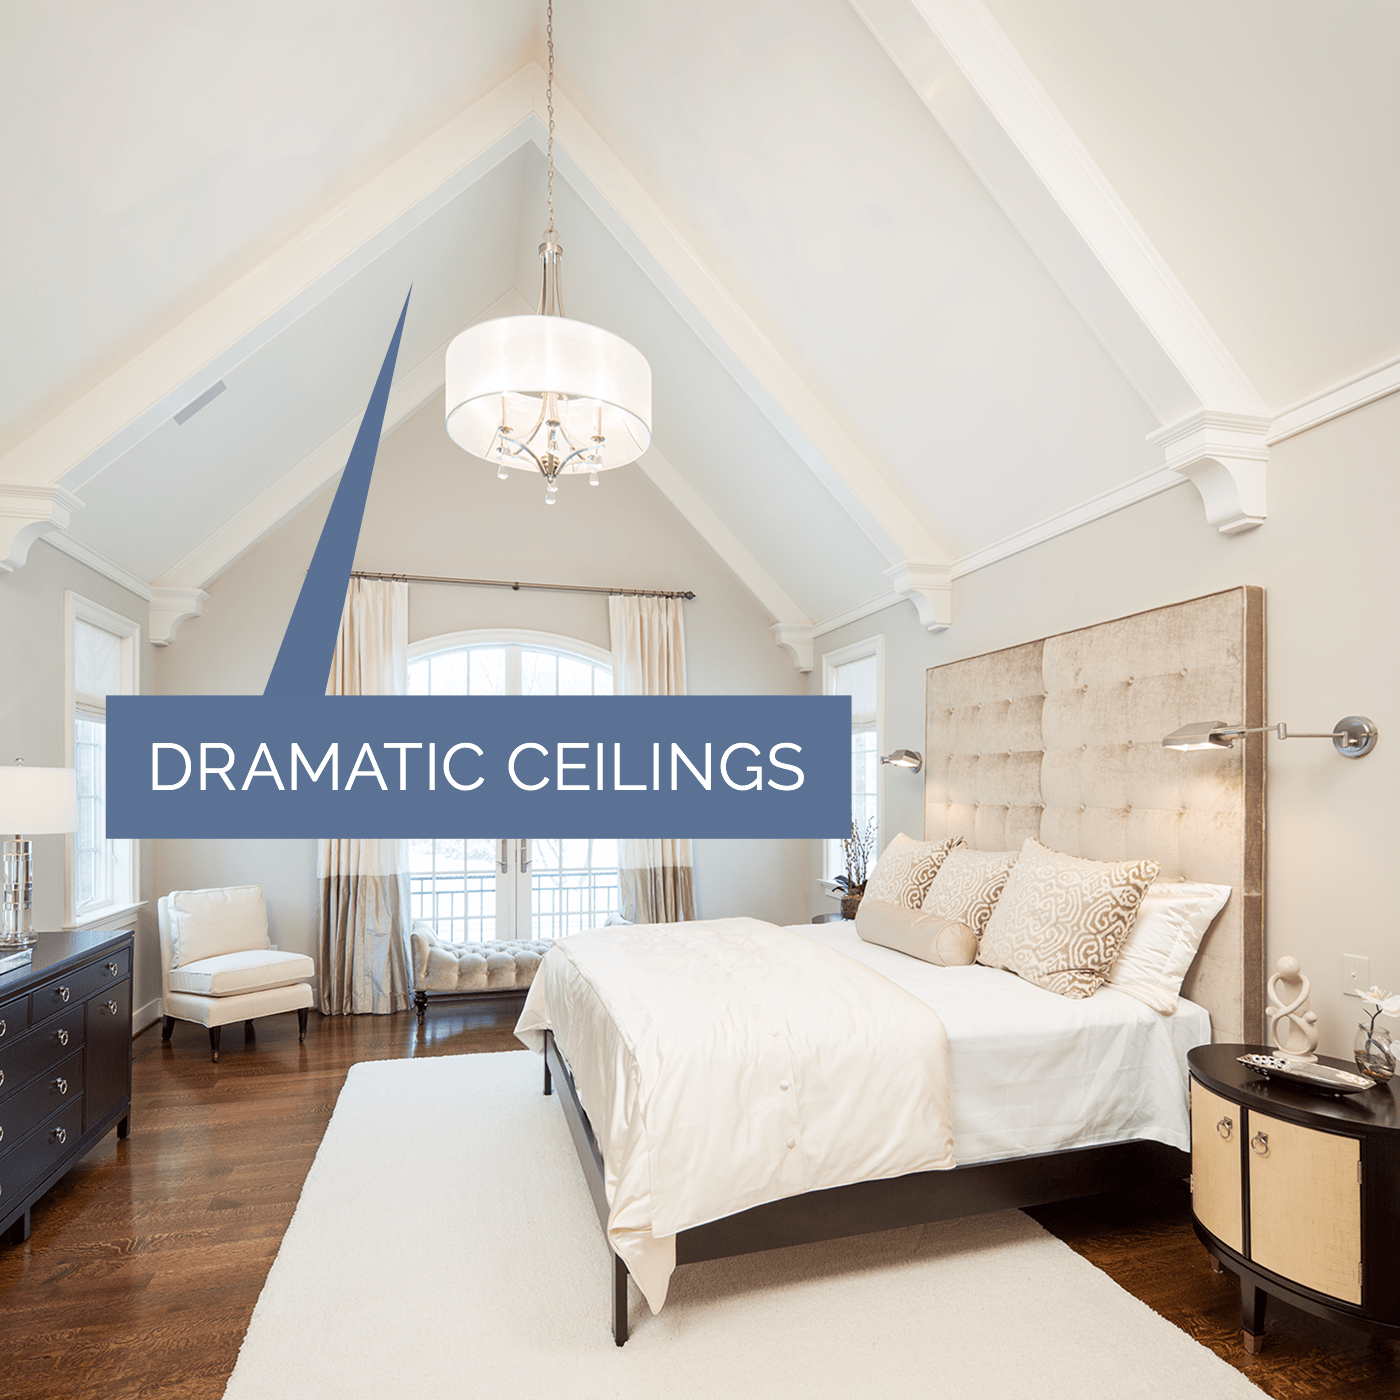 Image of a custom dramatic ceiling